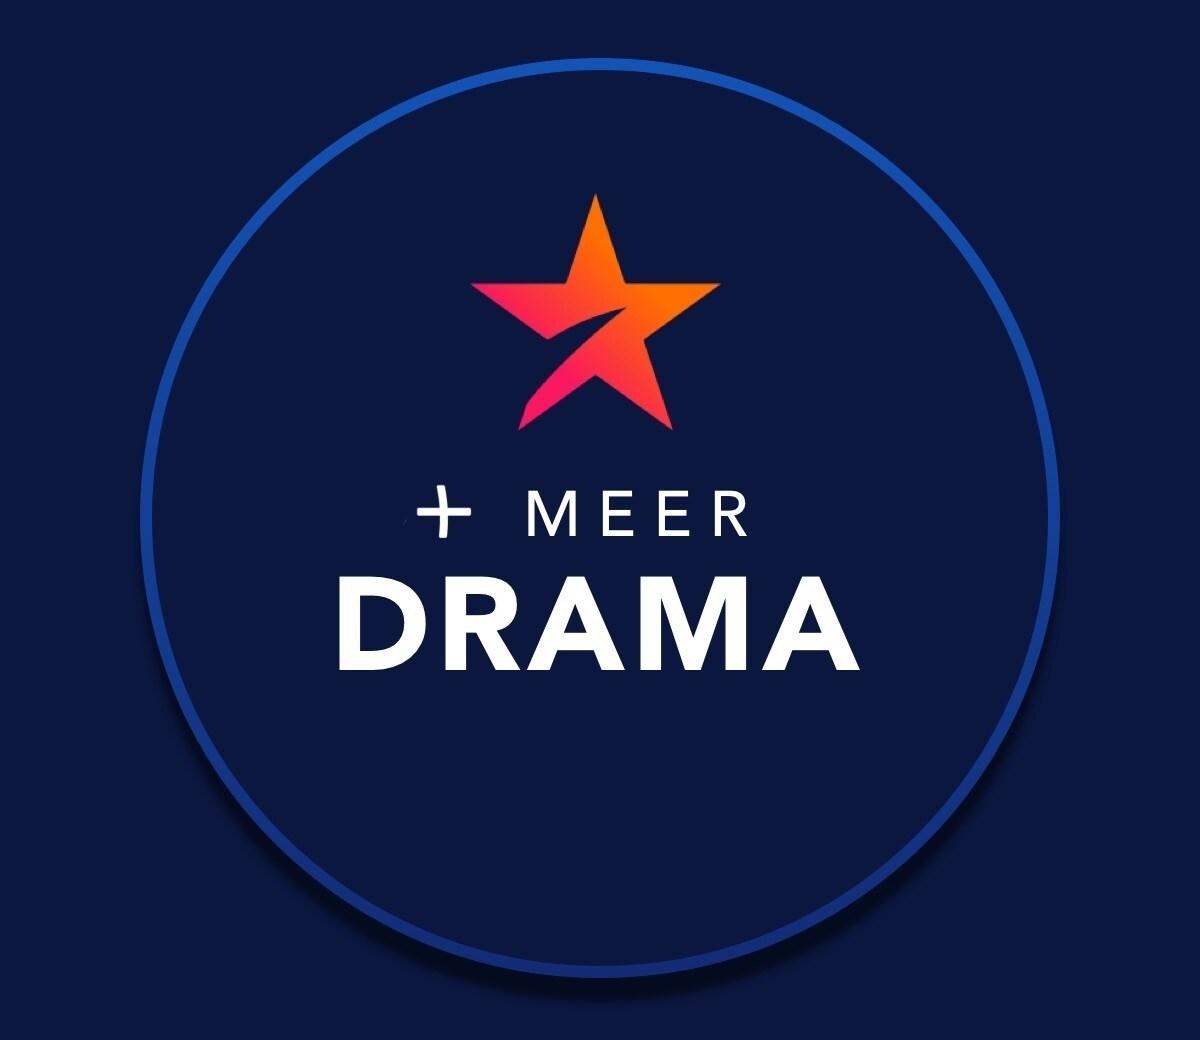 + Meer drama